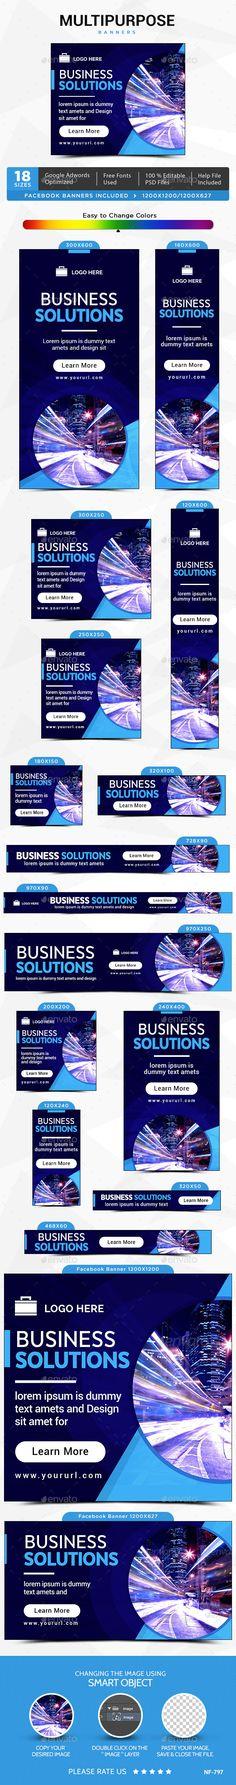 Multipurpose Banners Template PSD #design #ads Download: http://graphicriver.net/item/multipurpose-banners/13541594?ref=ksioks